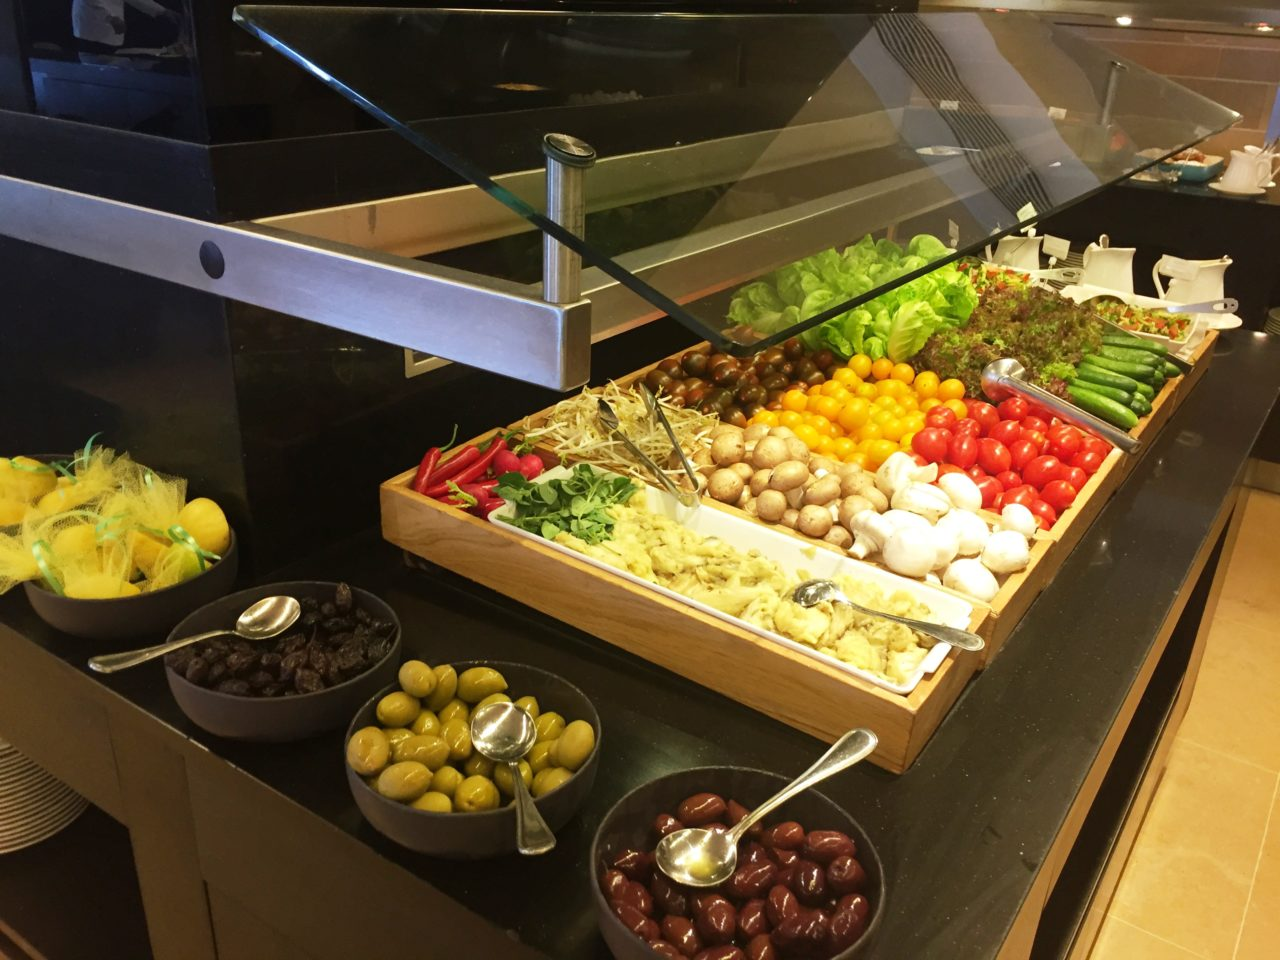 Israeli Breakfast : Farm Fresh Veggies and Olives